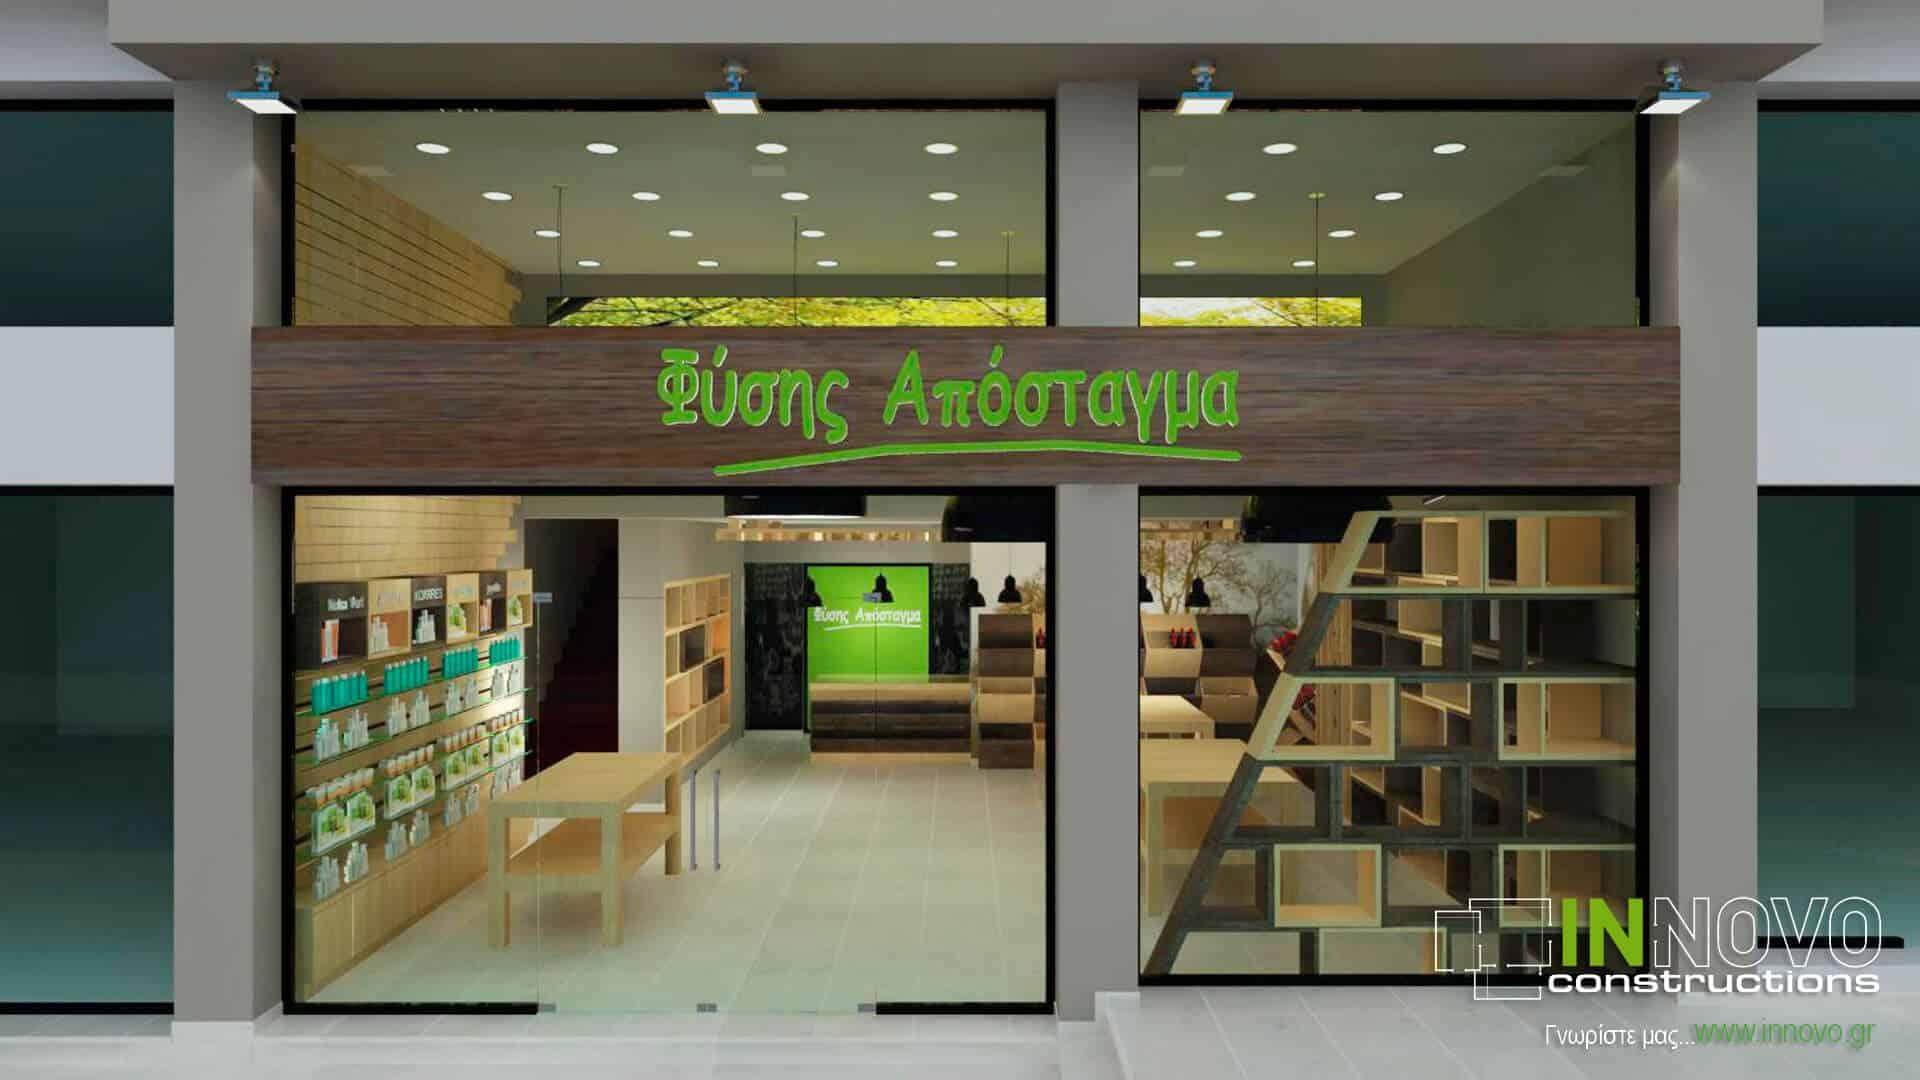 kataskevi-katastimatos-biologikon-proionton-organic-products-store-biologikaproionta-brilissia-1319-12